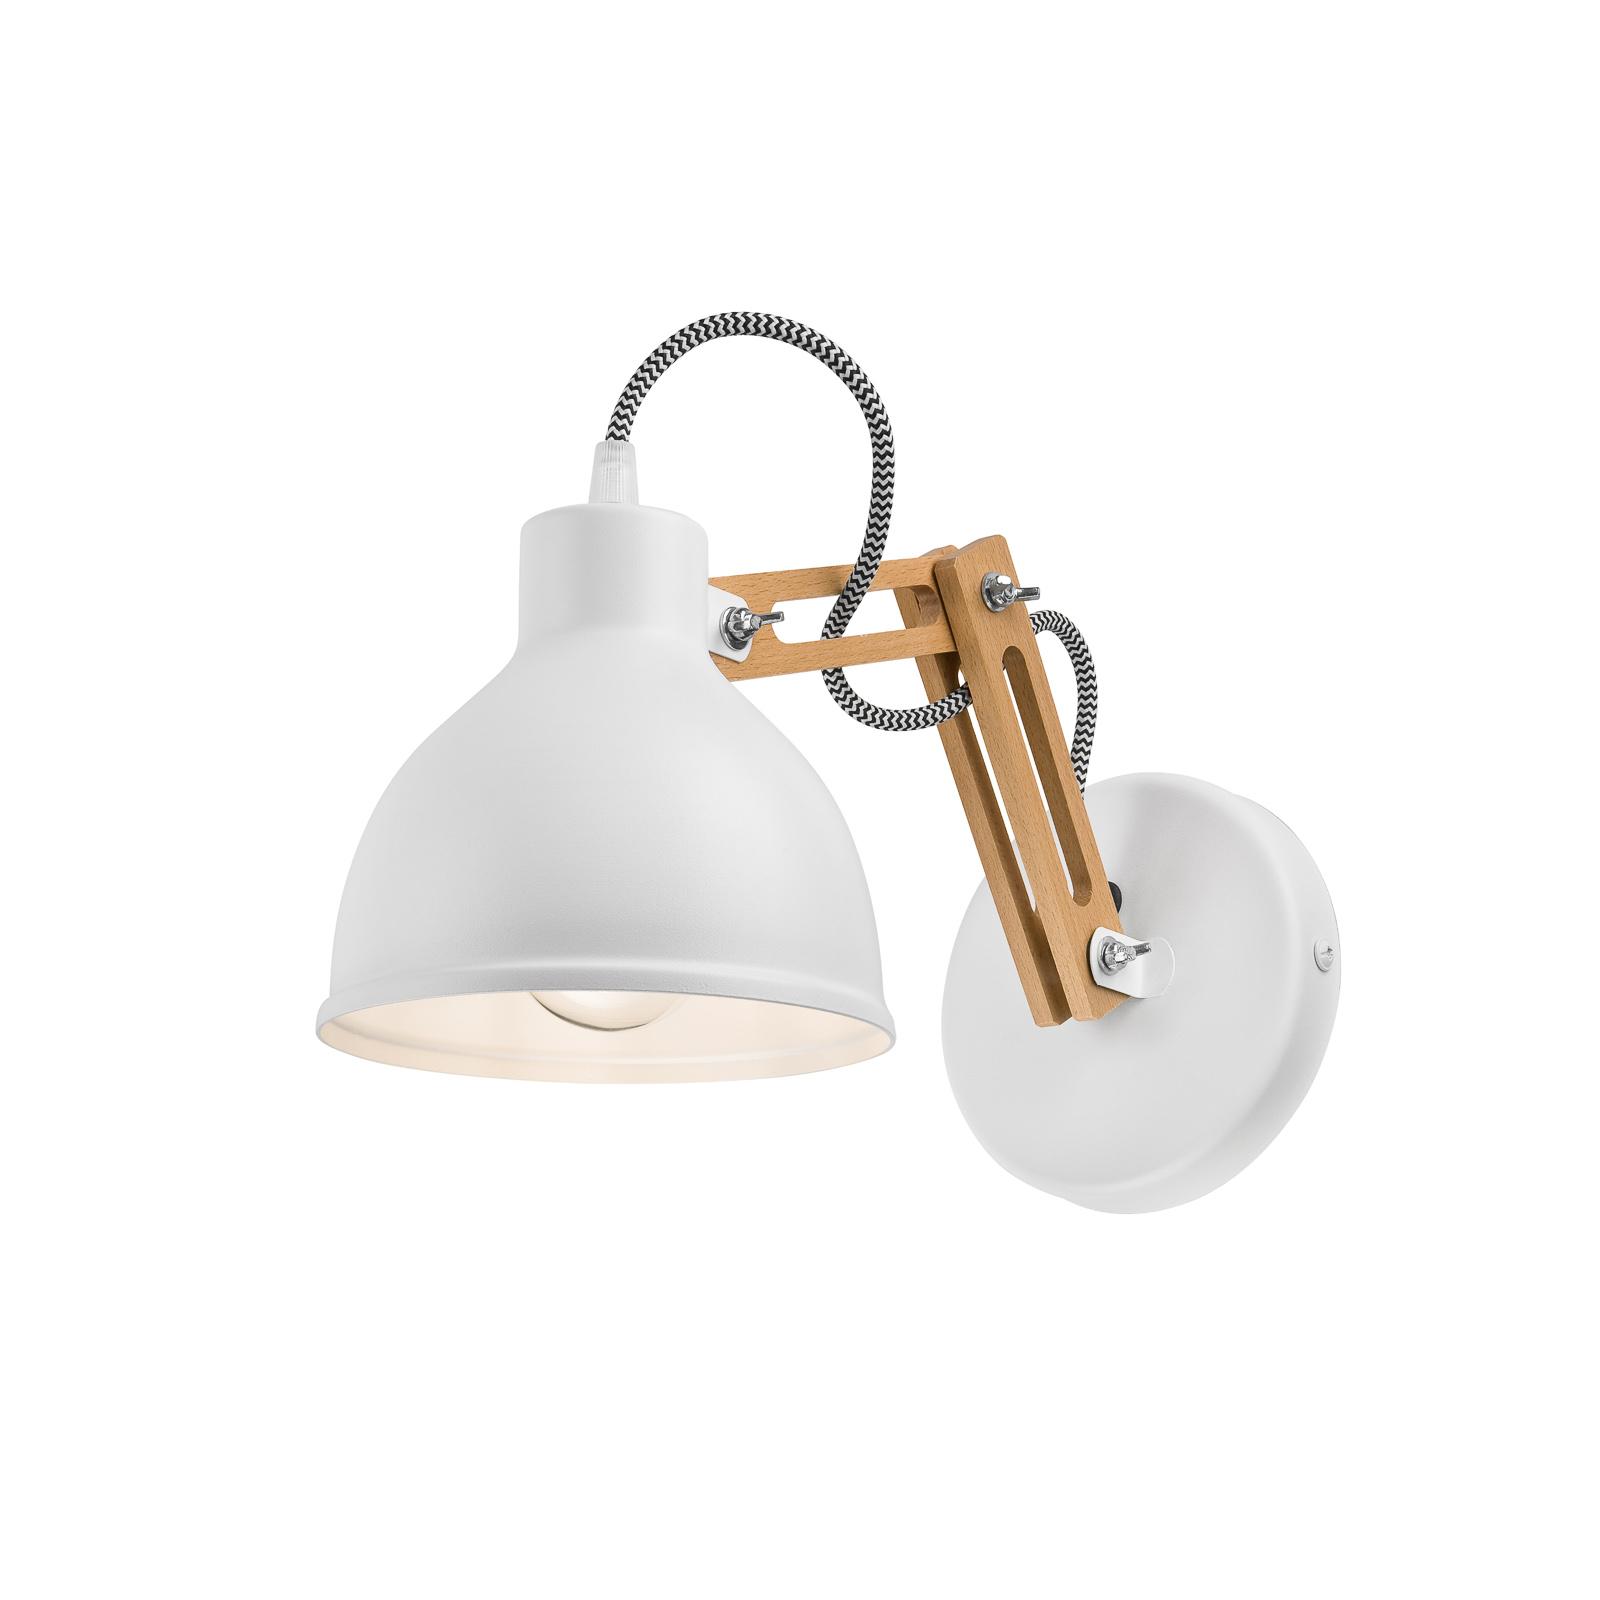 Skansen væglampe, justerbar træarm, hvid